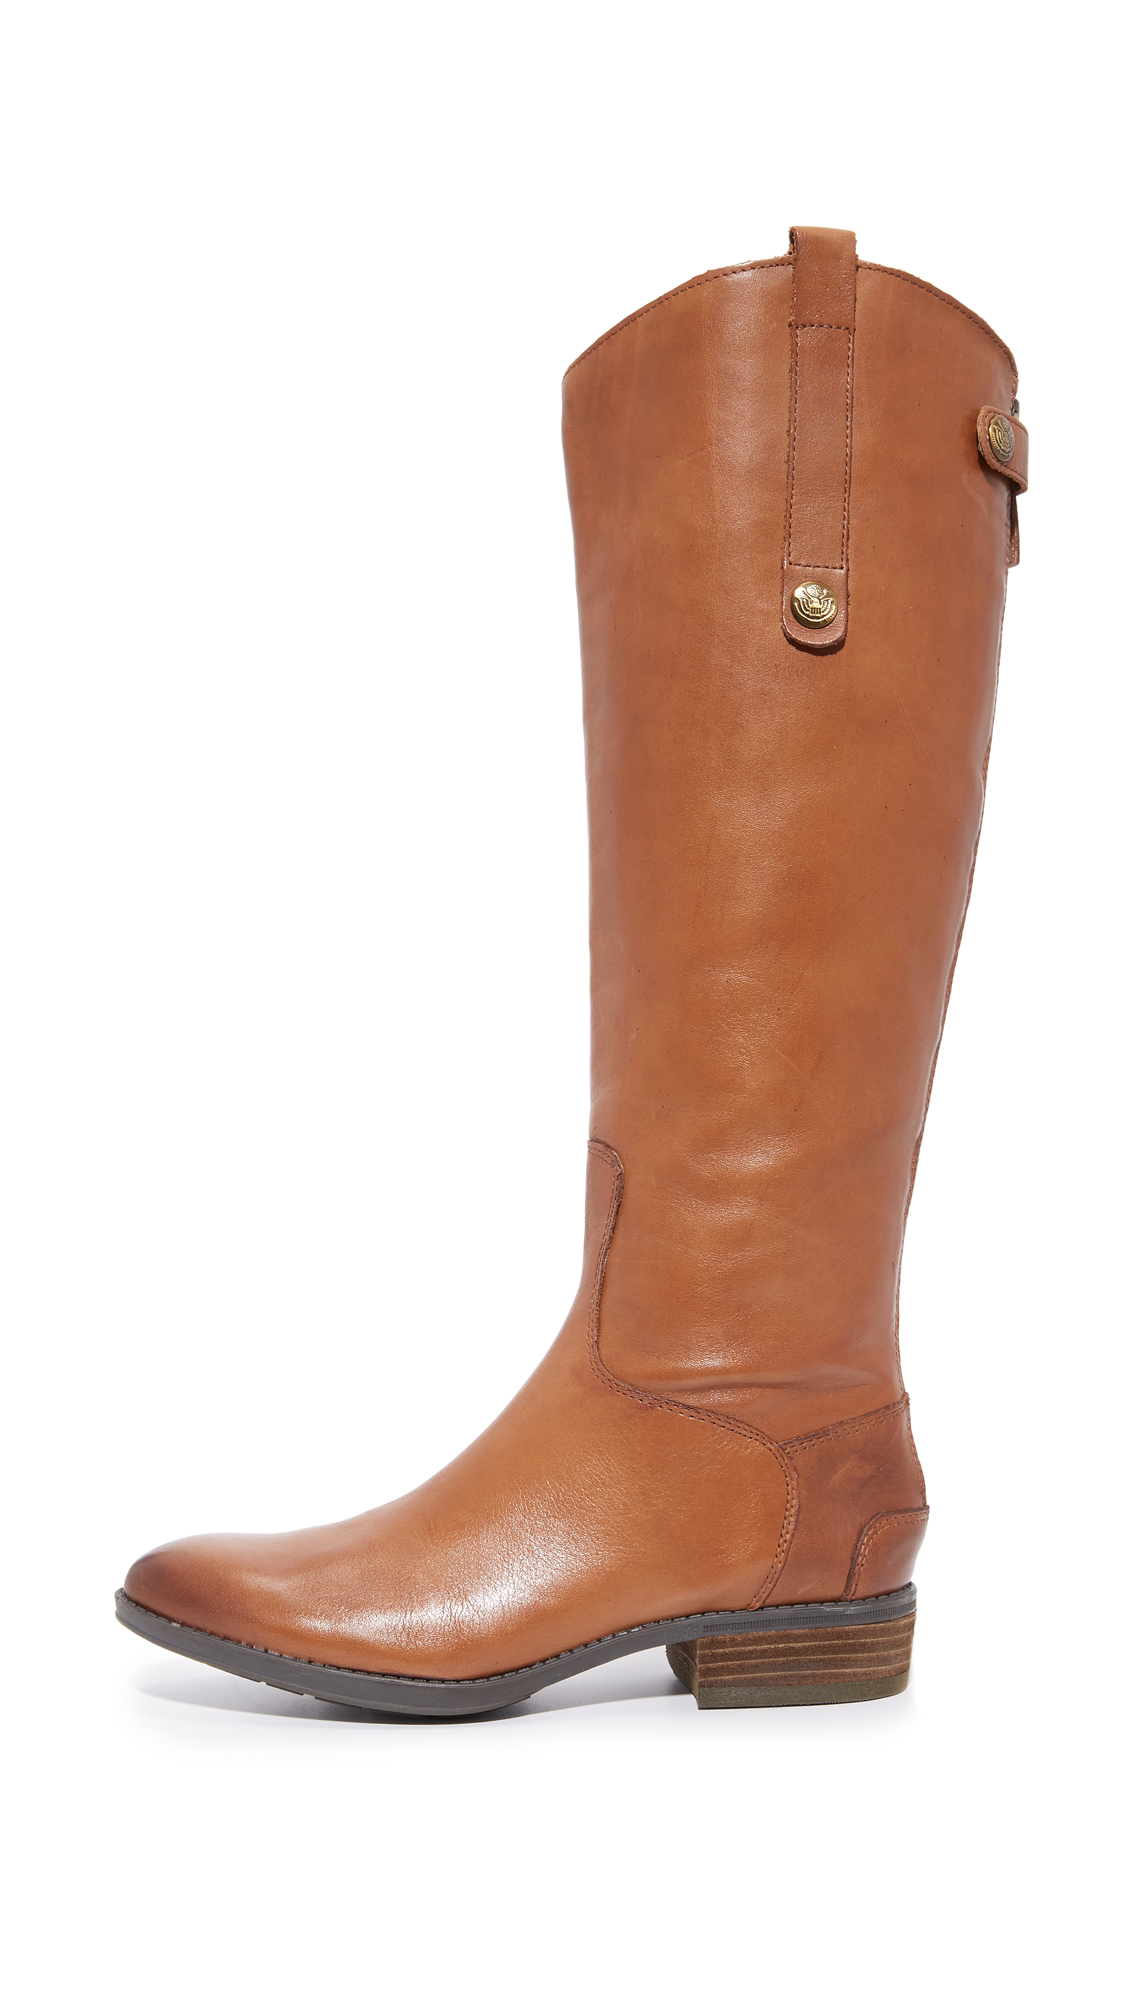 92c084e63f56 Sam Edelman Penny Riding Boots